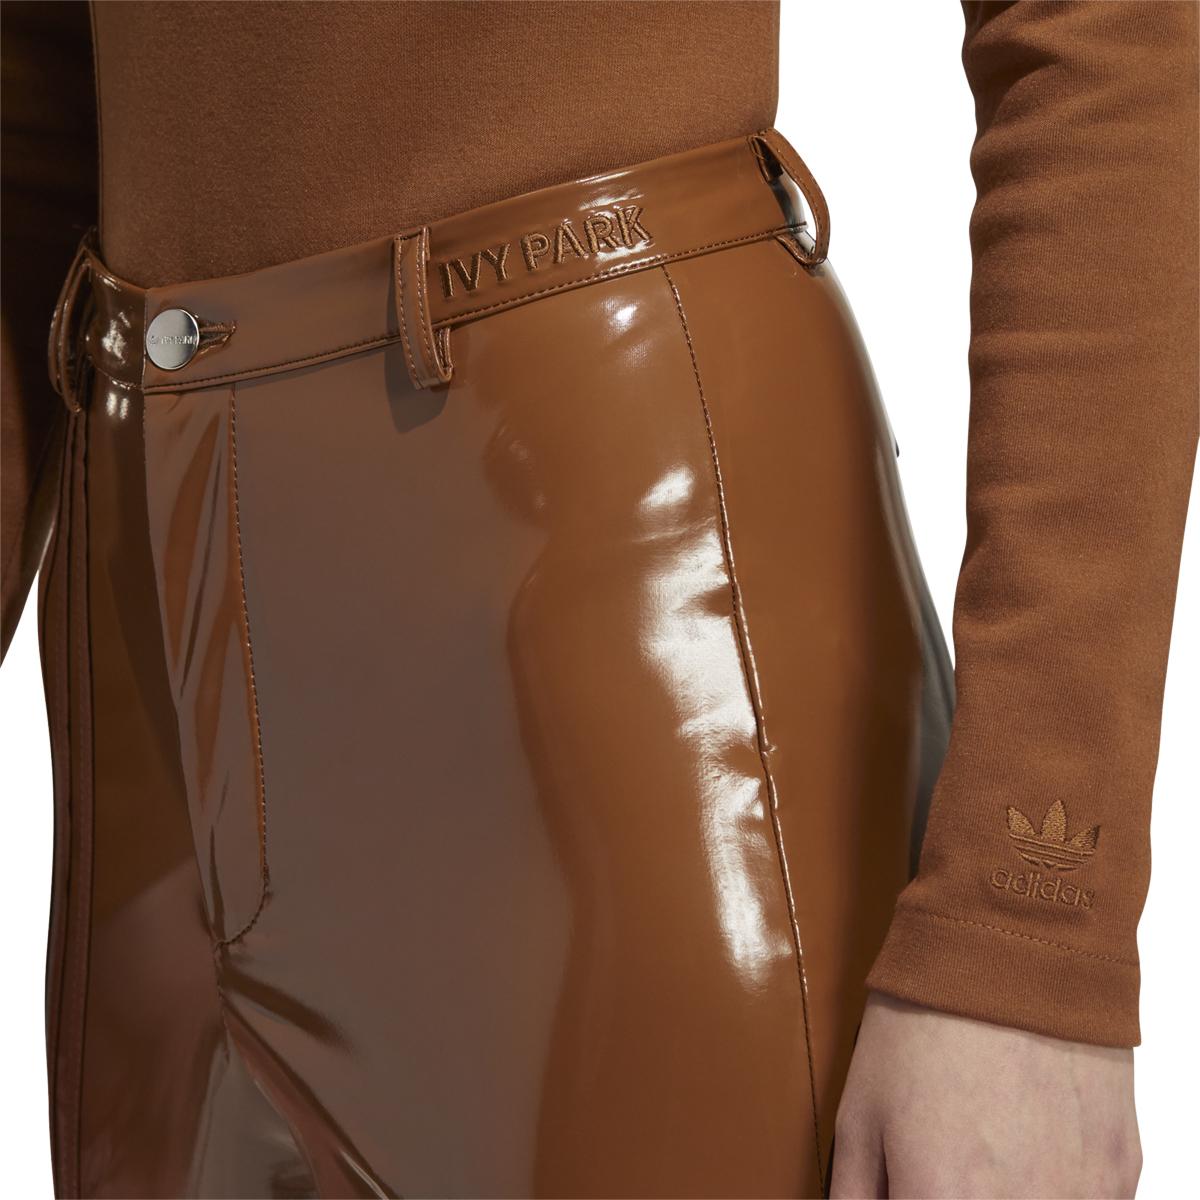 adidas IVY PARK Latext Pant Wild Brown